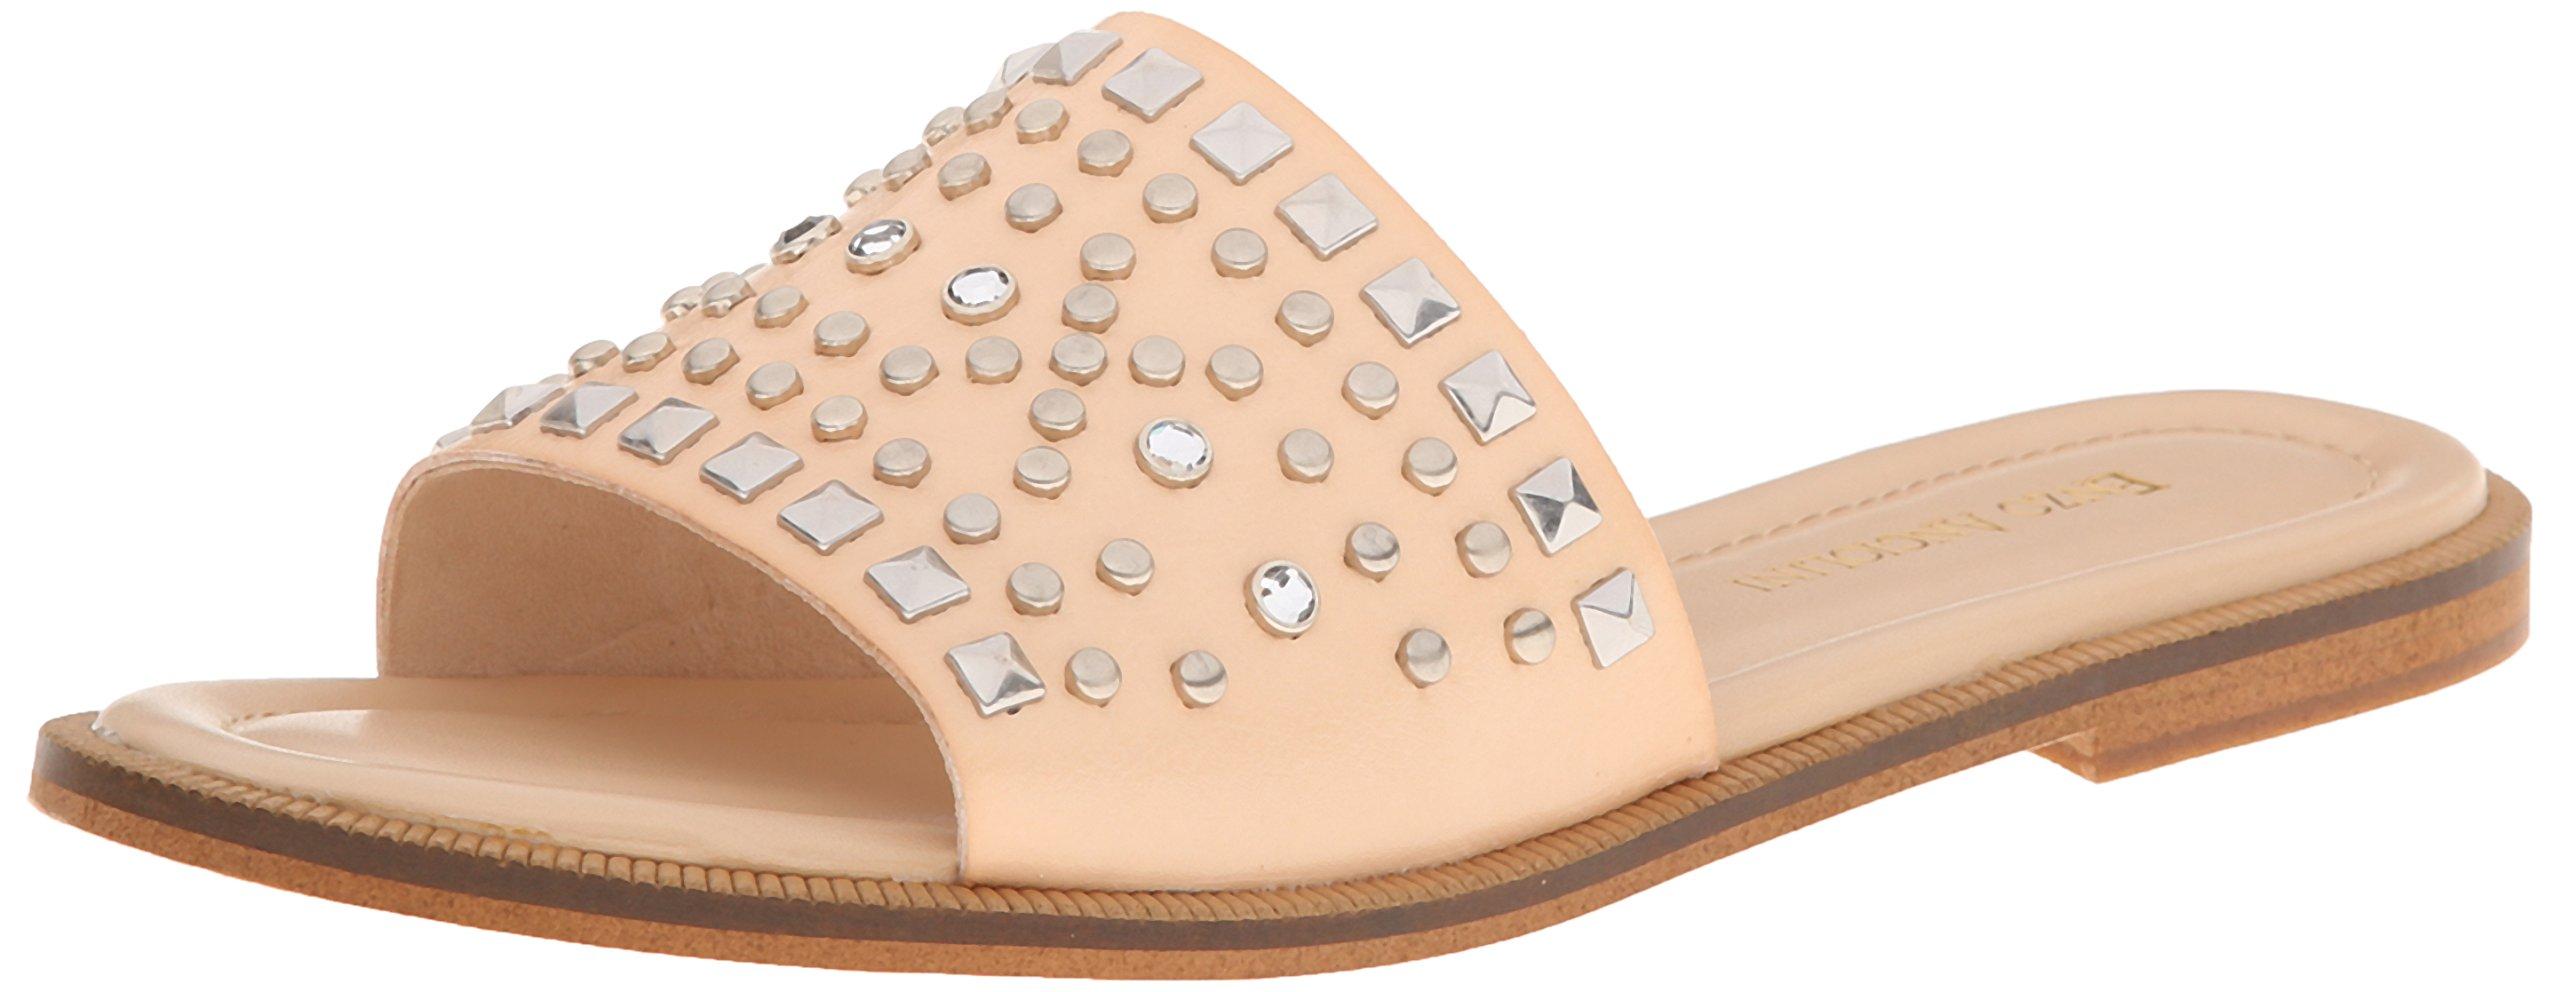 Enzo Angiolini Women's Jaydra Gladiator Sandal, Natural, 8 M US